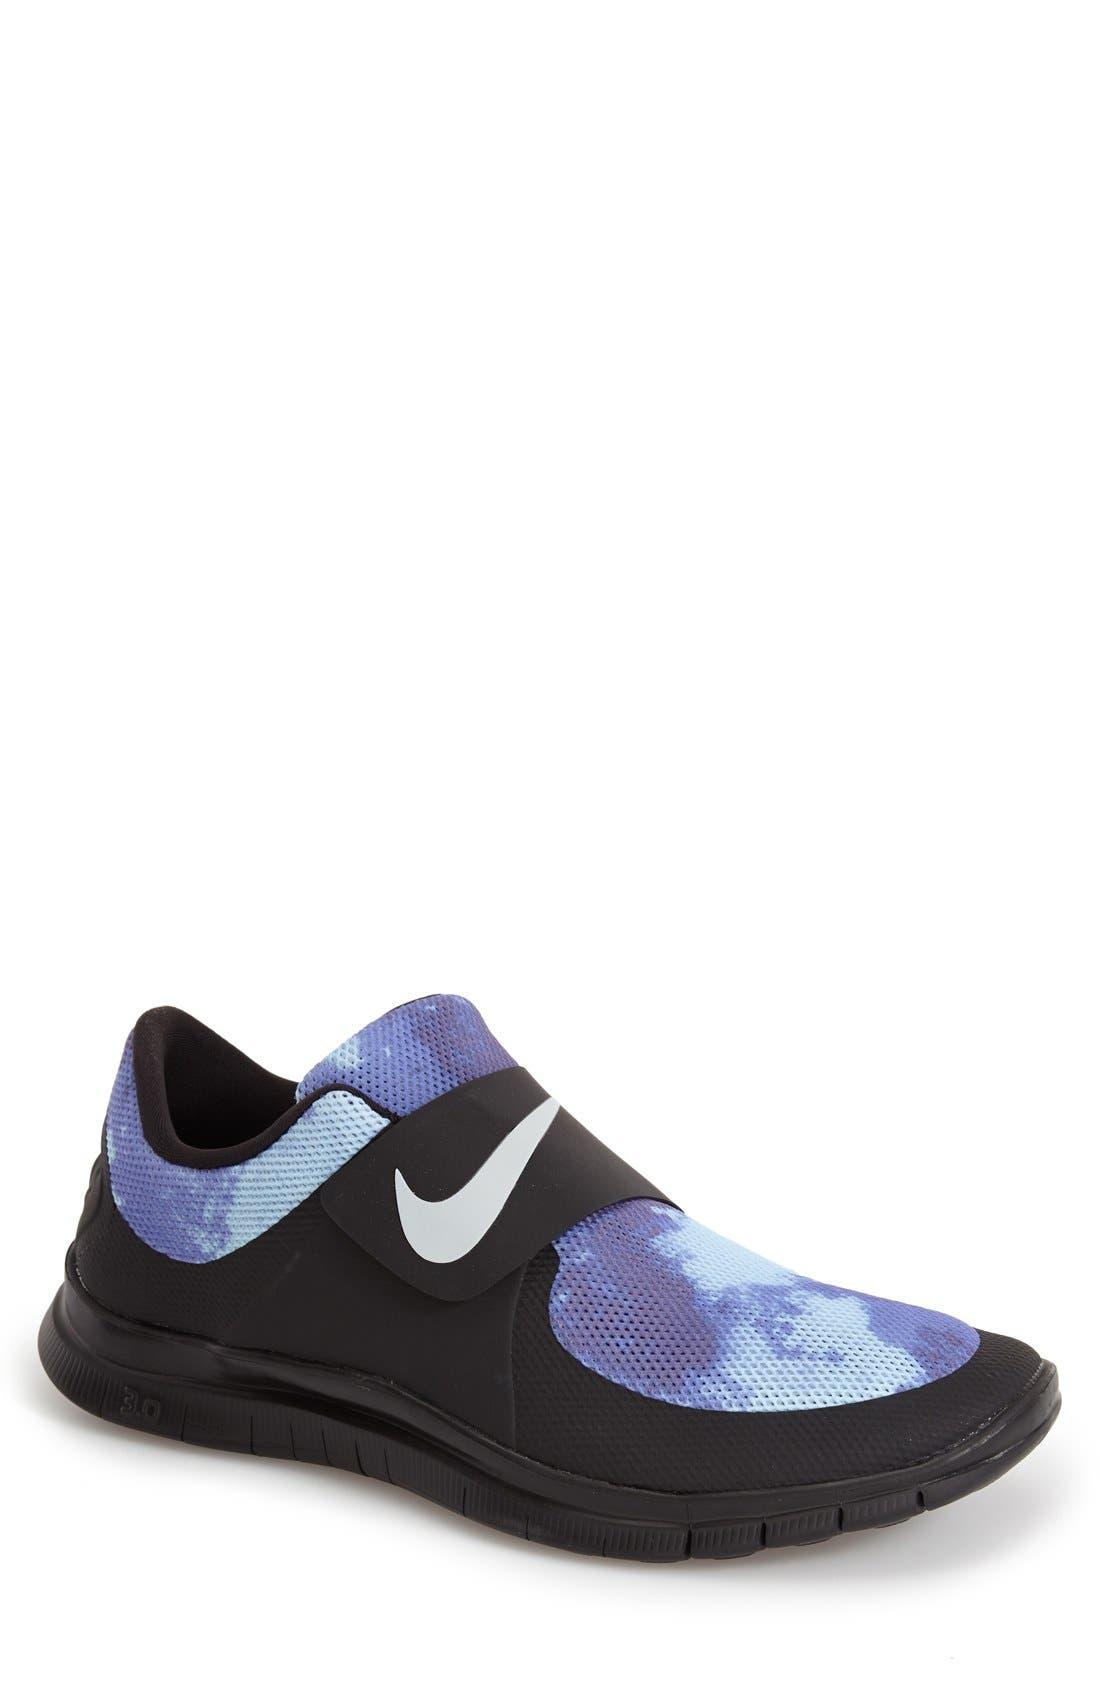 NIKE 'Free Socfly SD' Sneaker, Main, color, 004